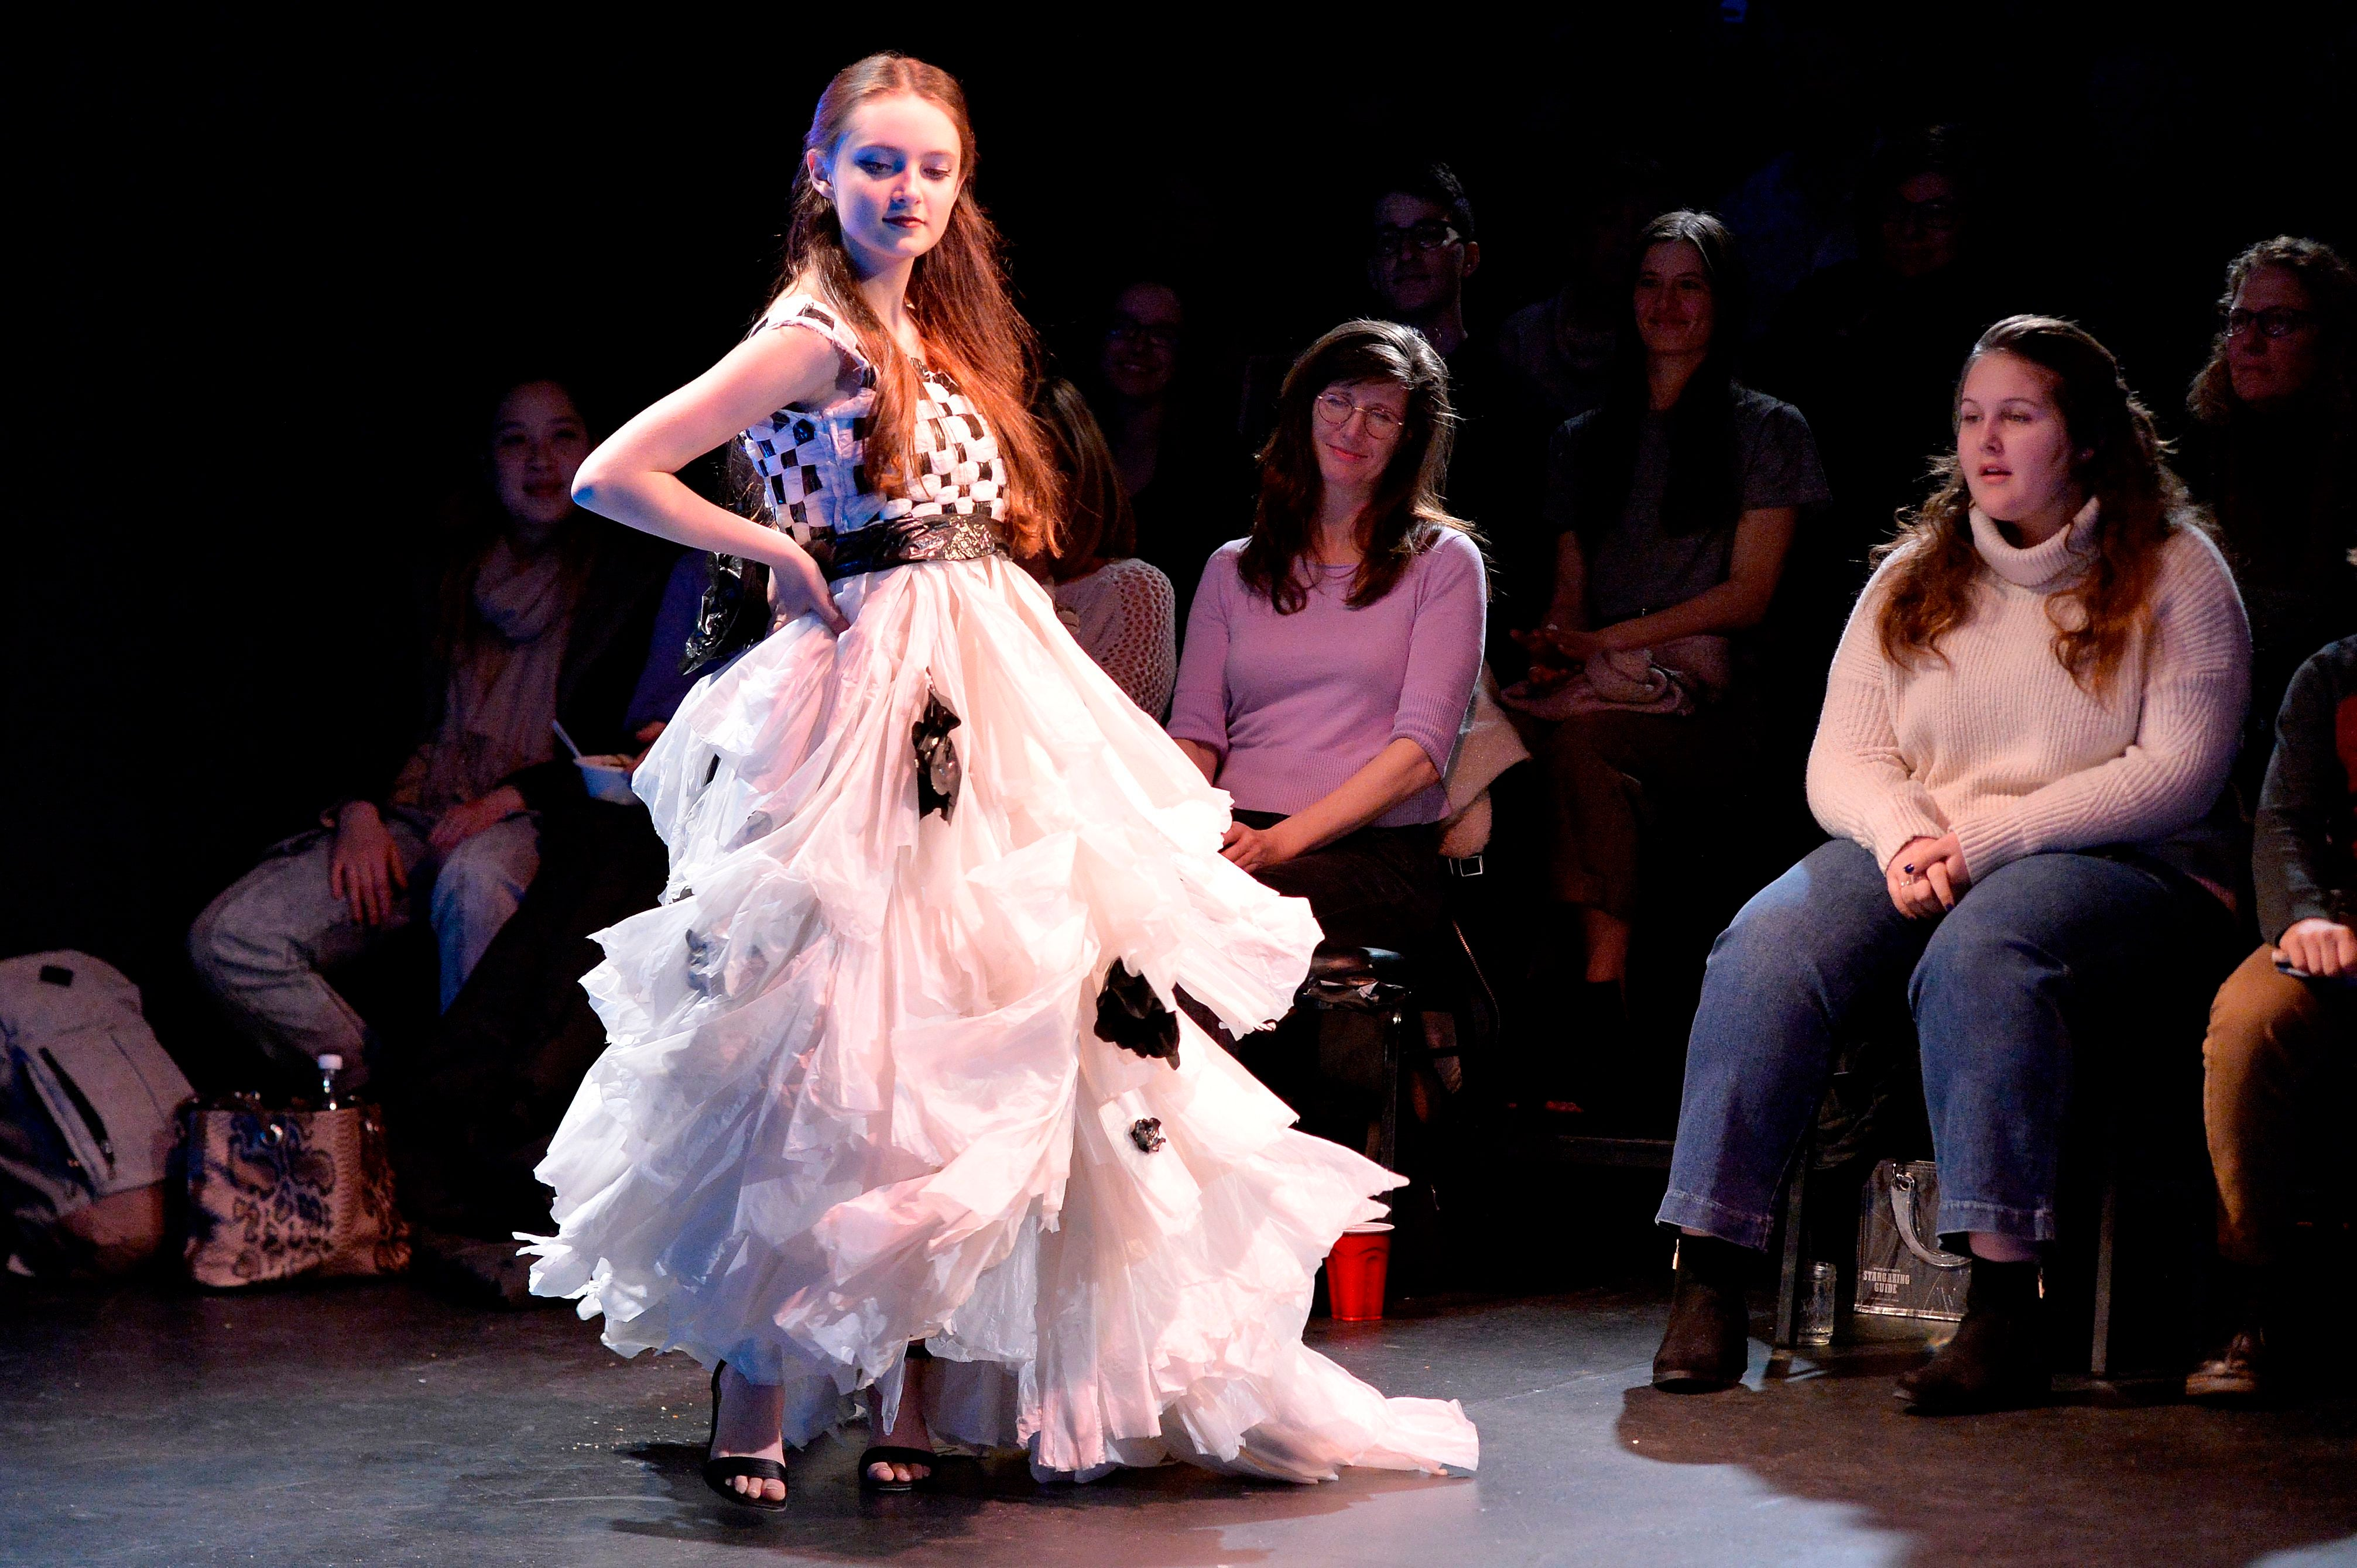 23 Trashy Looks Served At Rubbish To Runway Fashion Show Boston Com